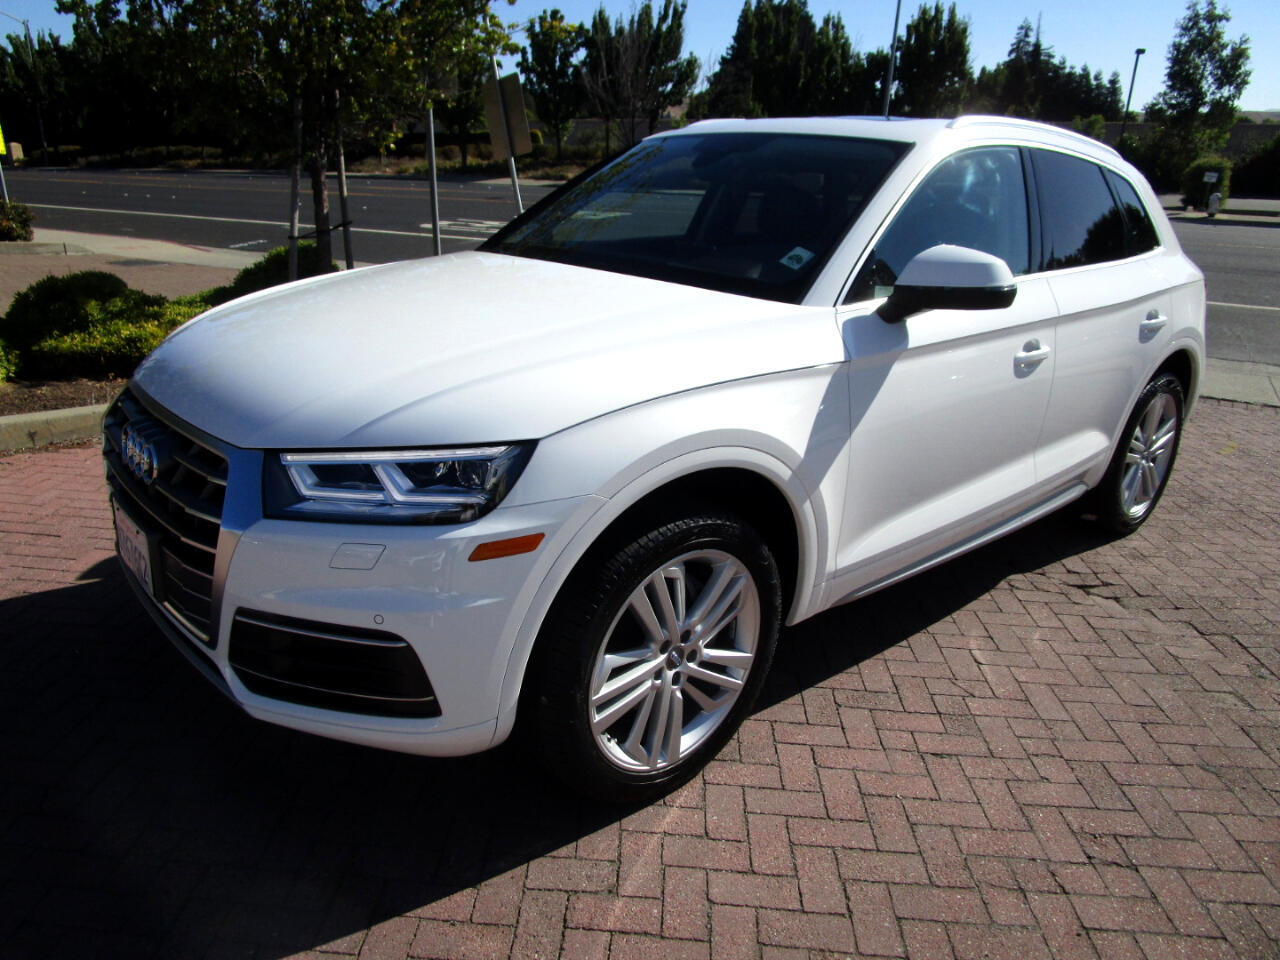 2018 Audi Q5 PREMIUM PLUS AWD**HEAT SEATS**BLIND SPOT**PANO ROO